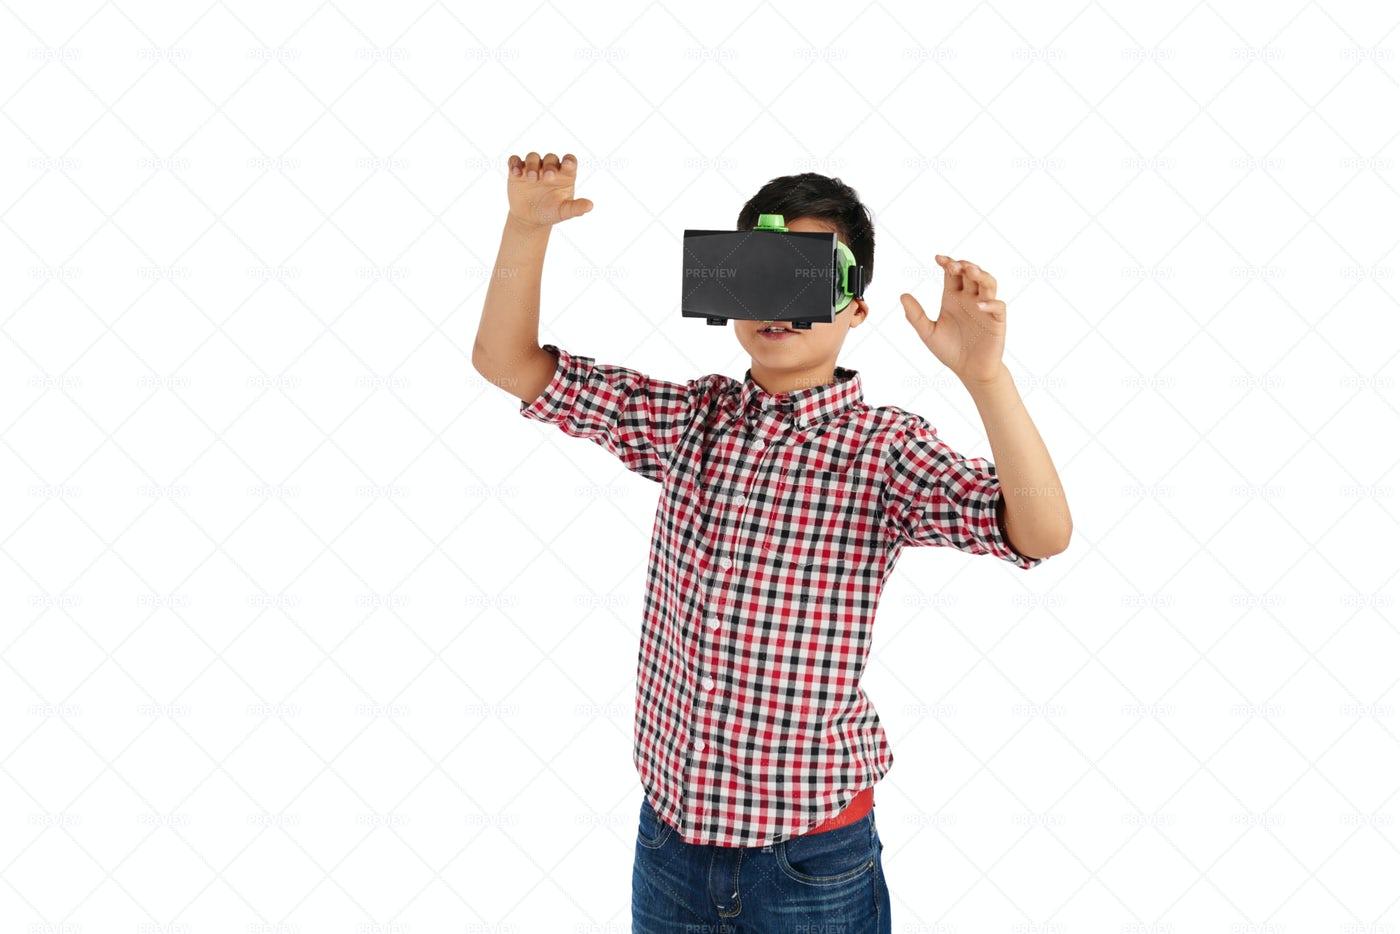 Enjoying Virtual Reality: Stock Photos